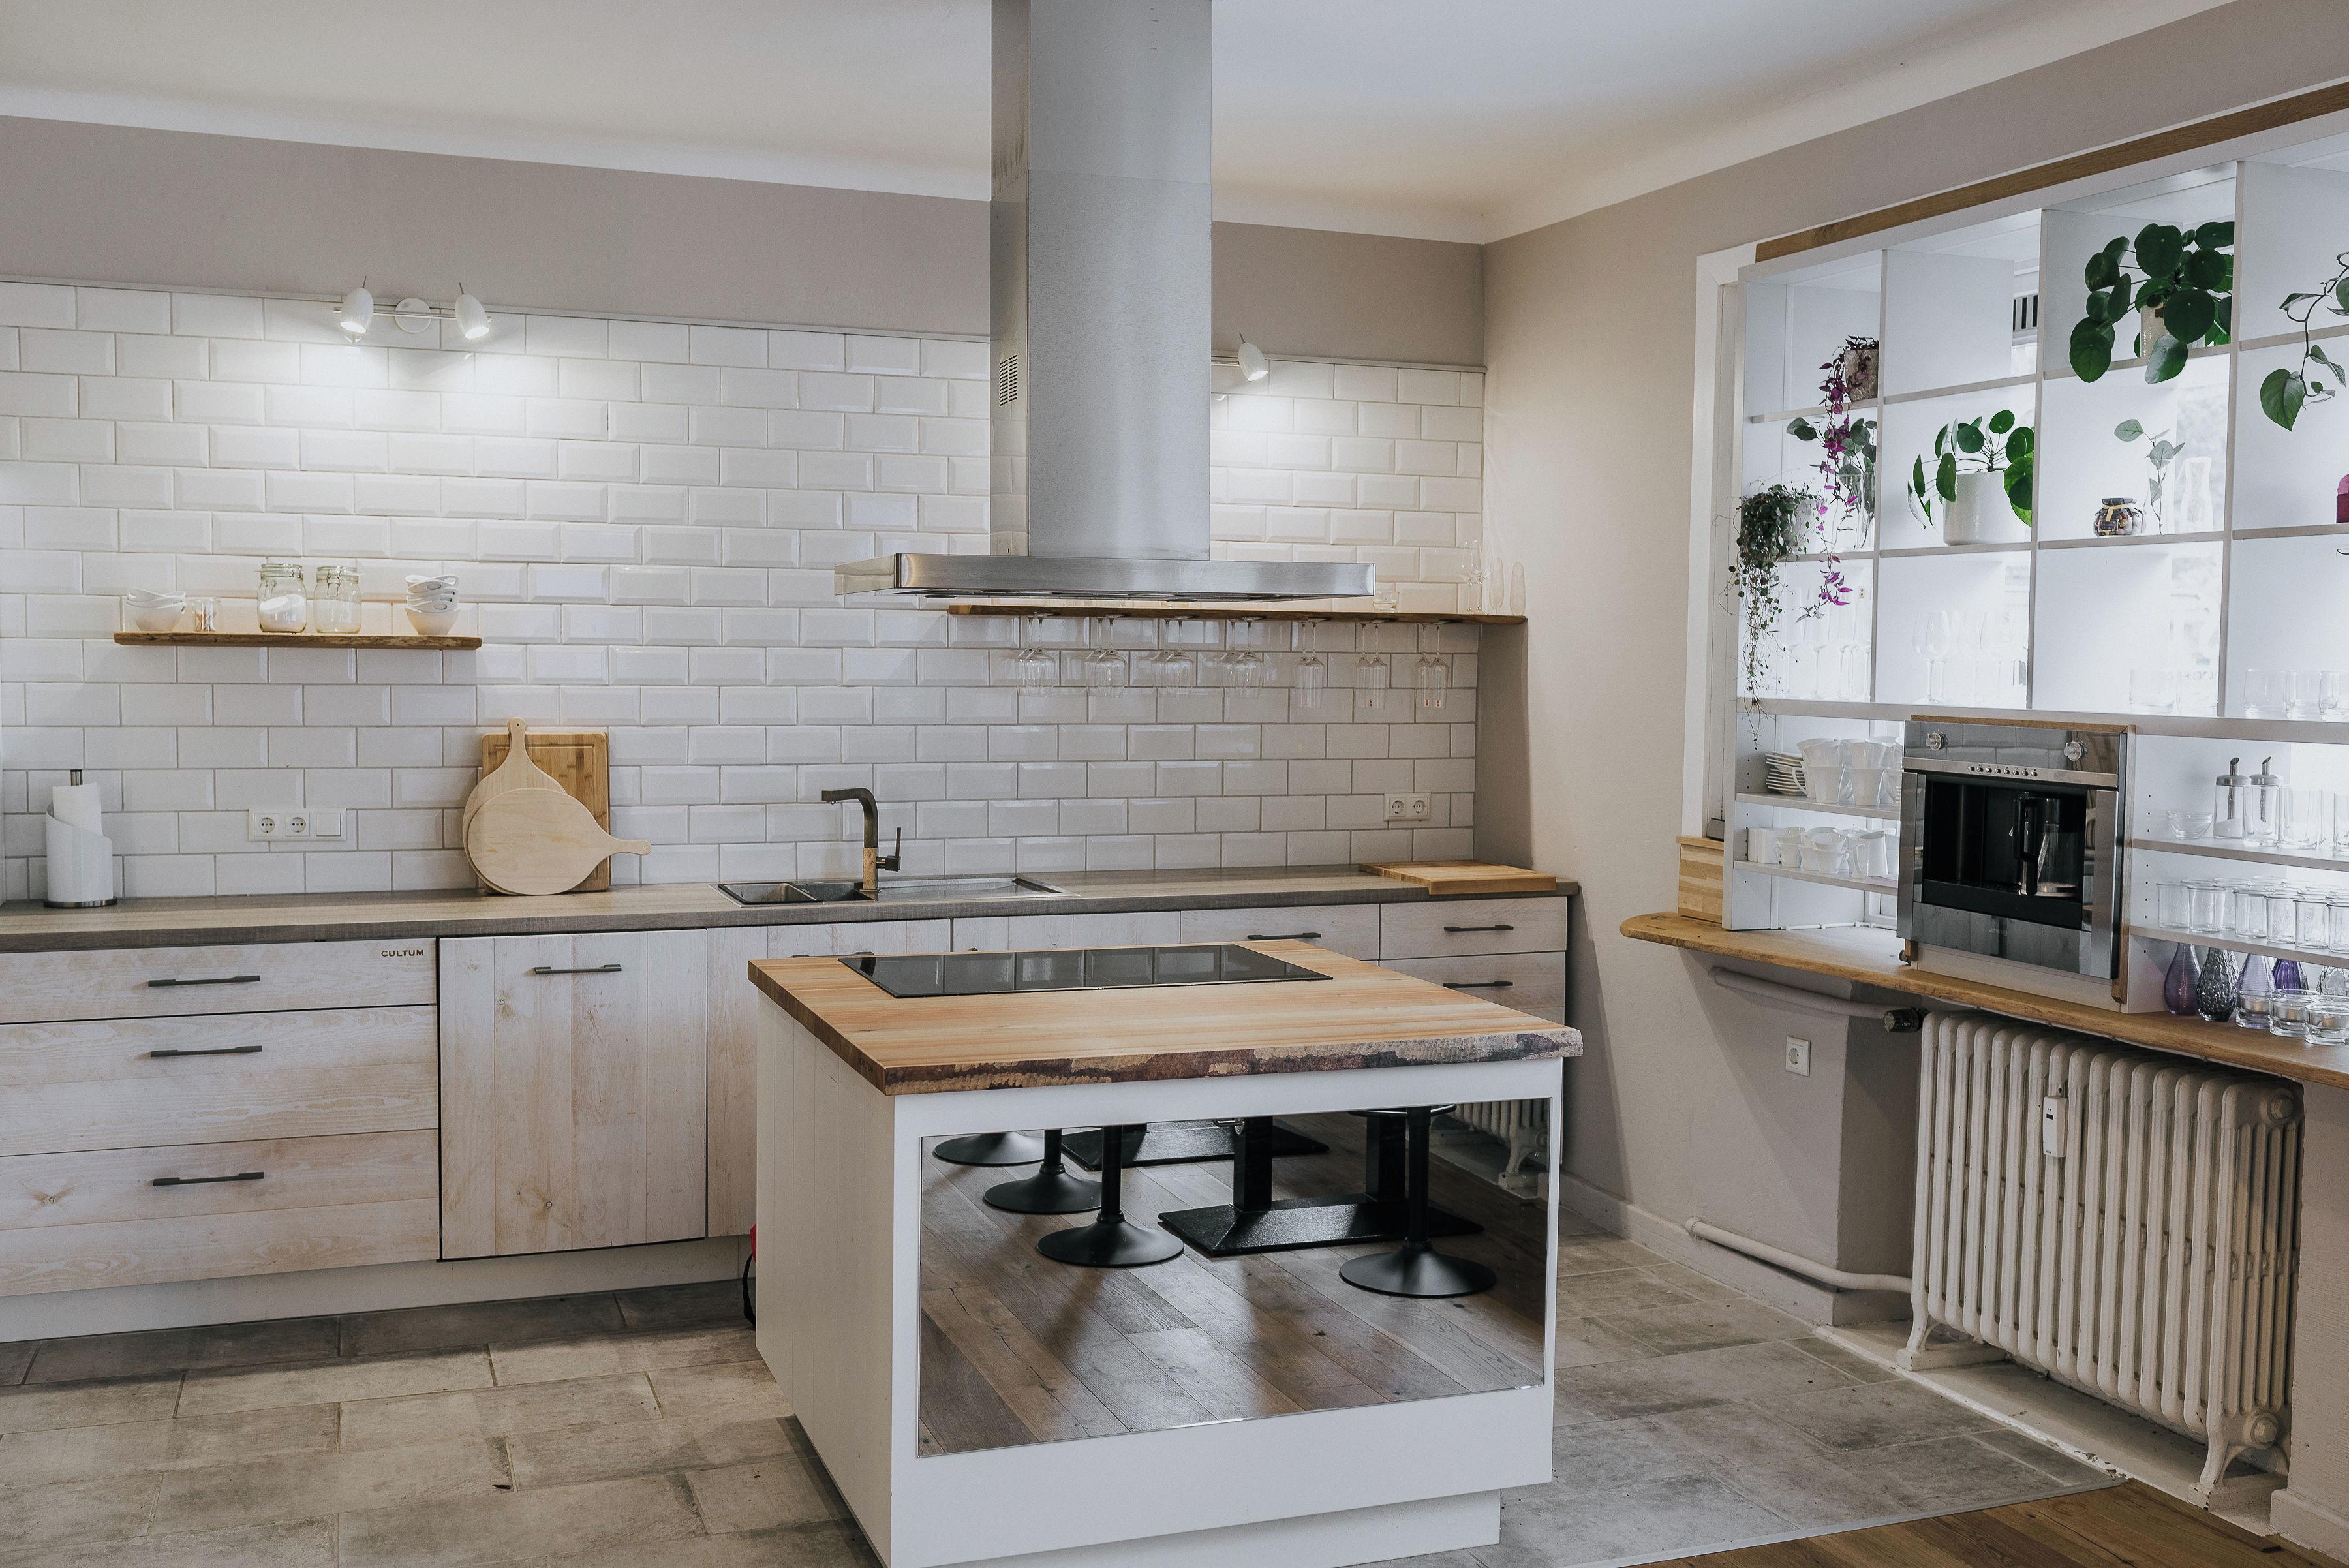 Hamburg Küche Küche El Rincón Kochstudio image 1